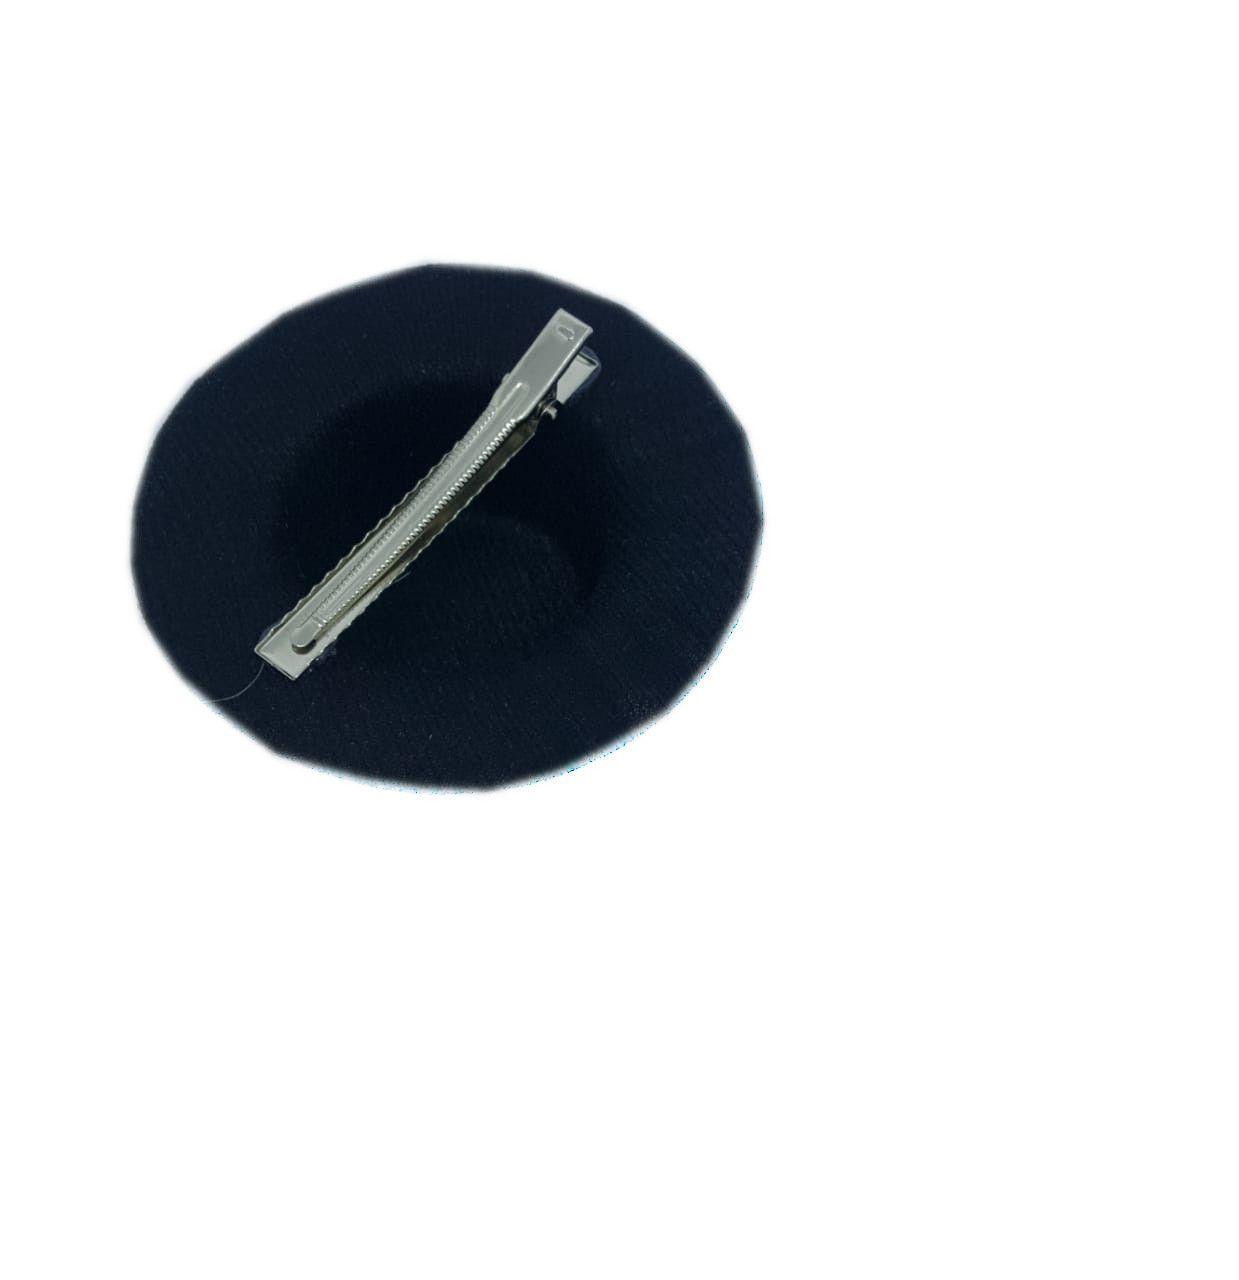 Mini Chapéu Luxo c/ presilha Prata - unidade